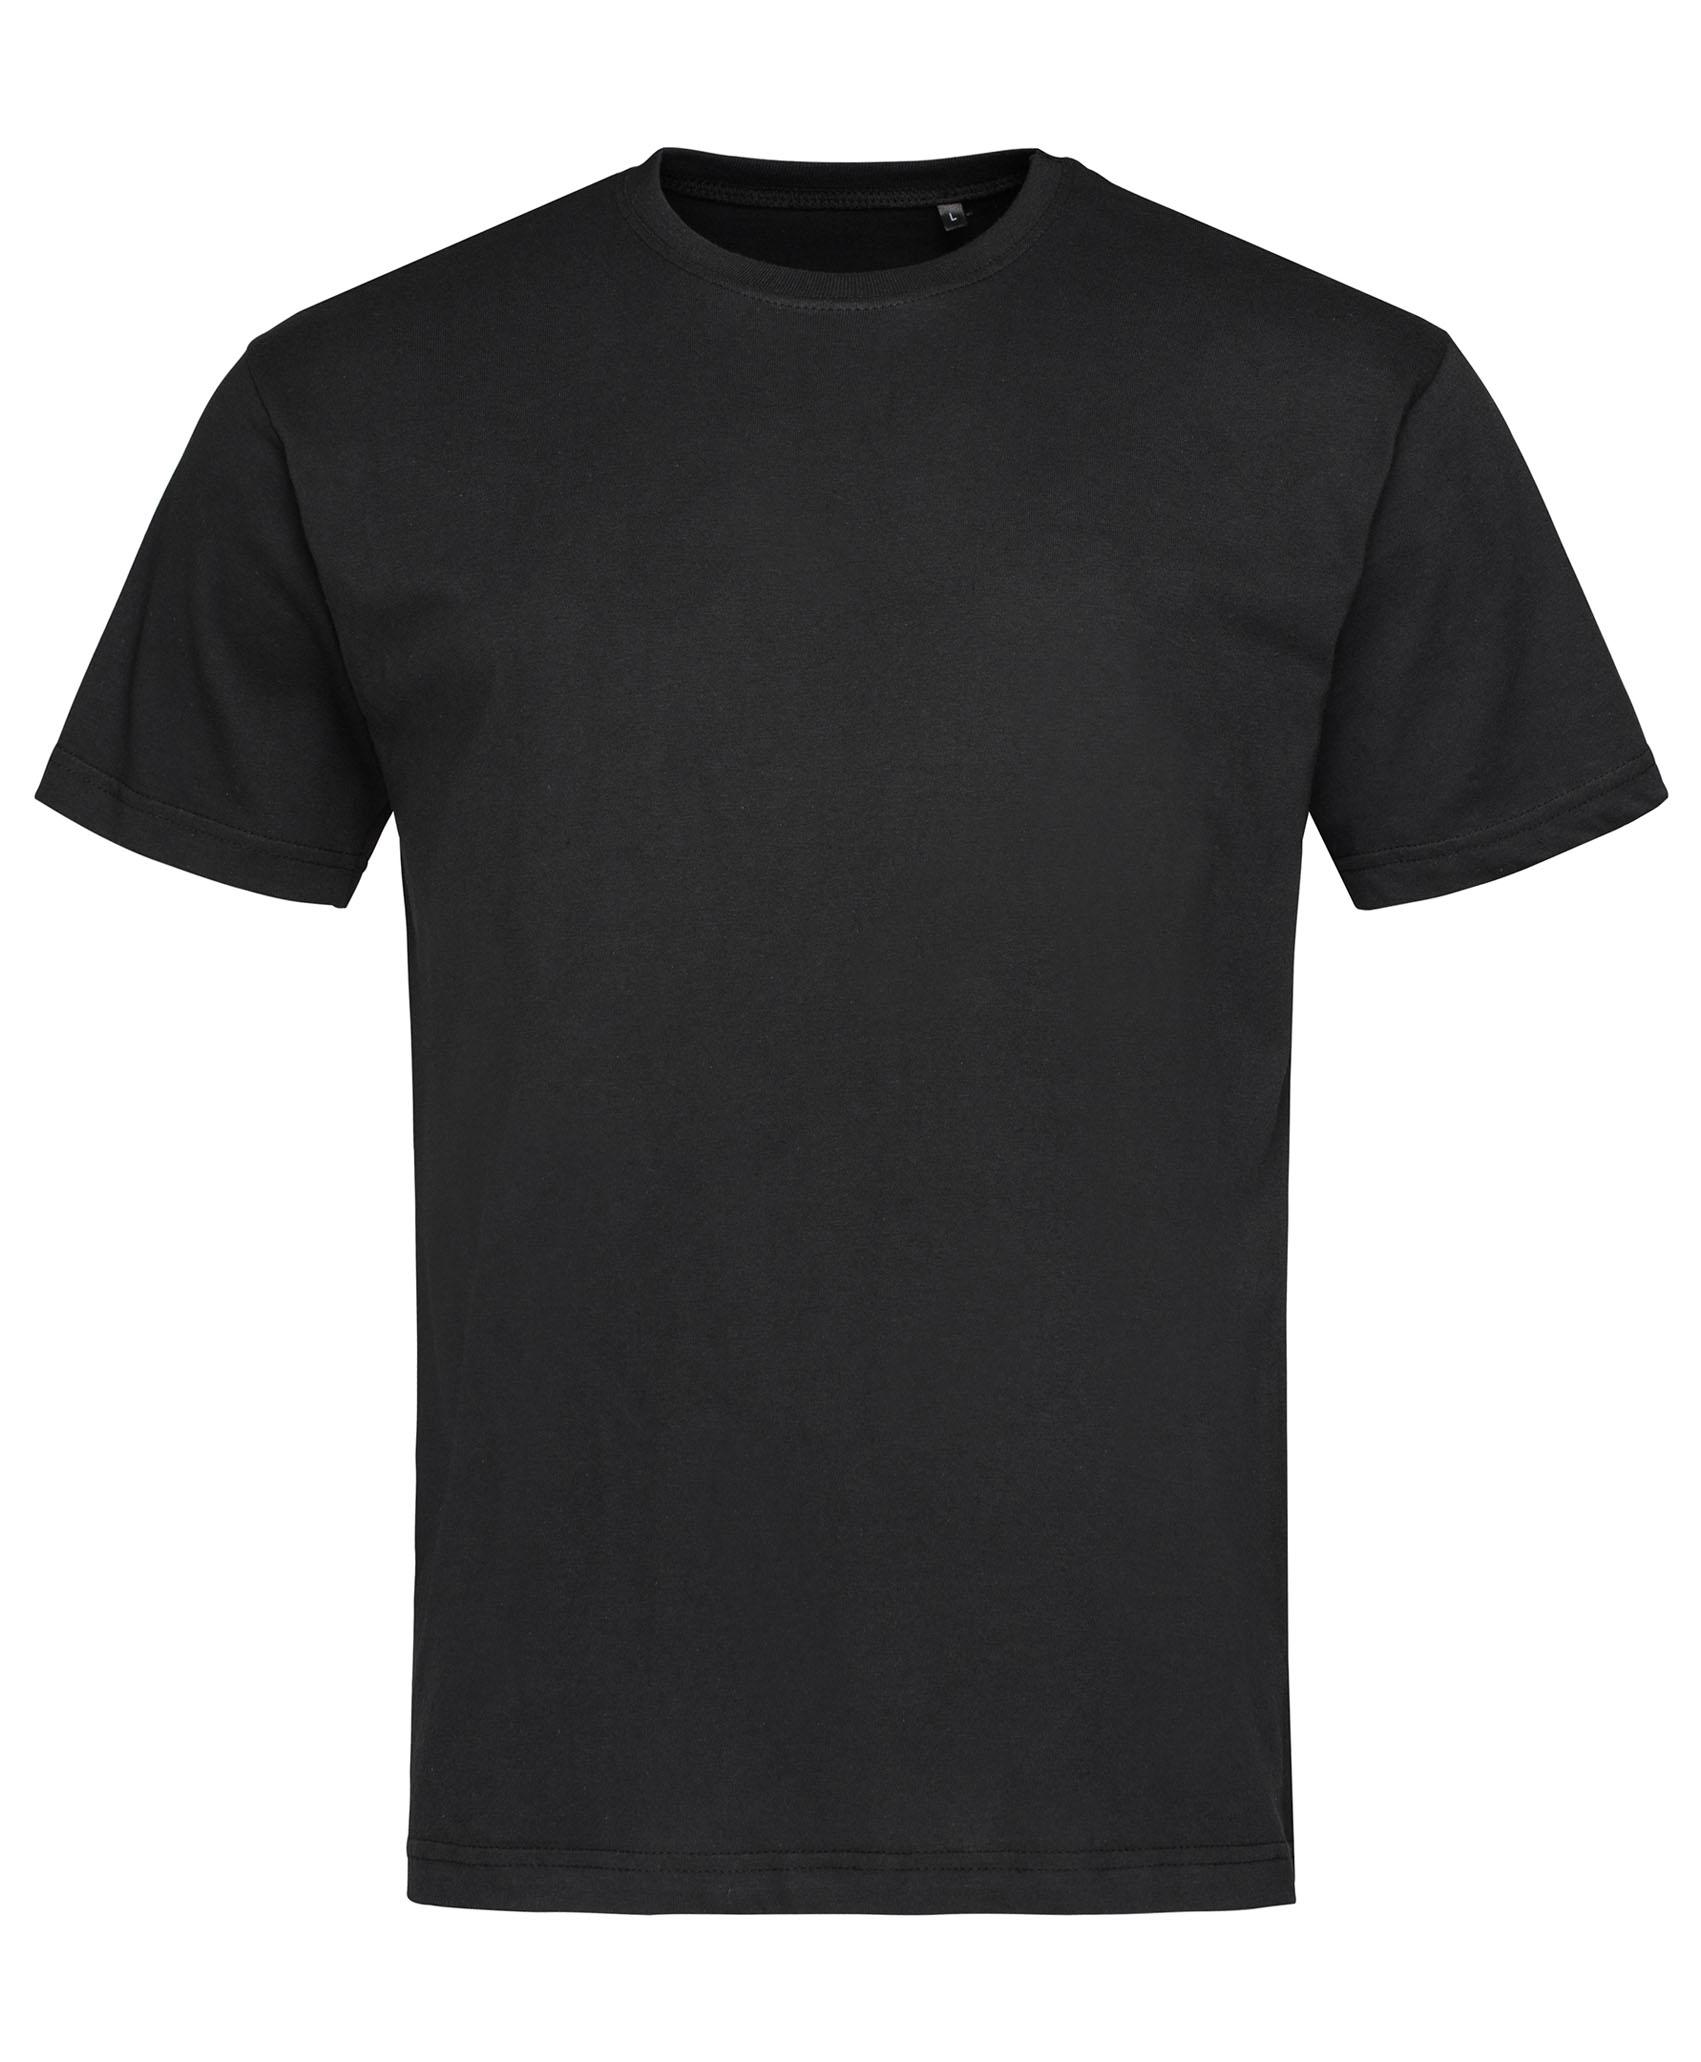 Stedman T-shirt NANO SS for him